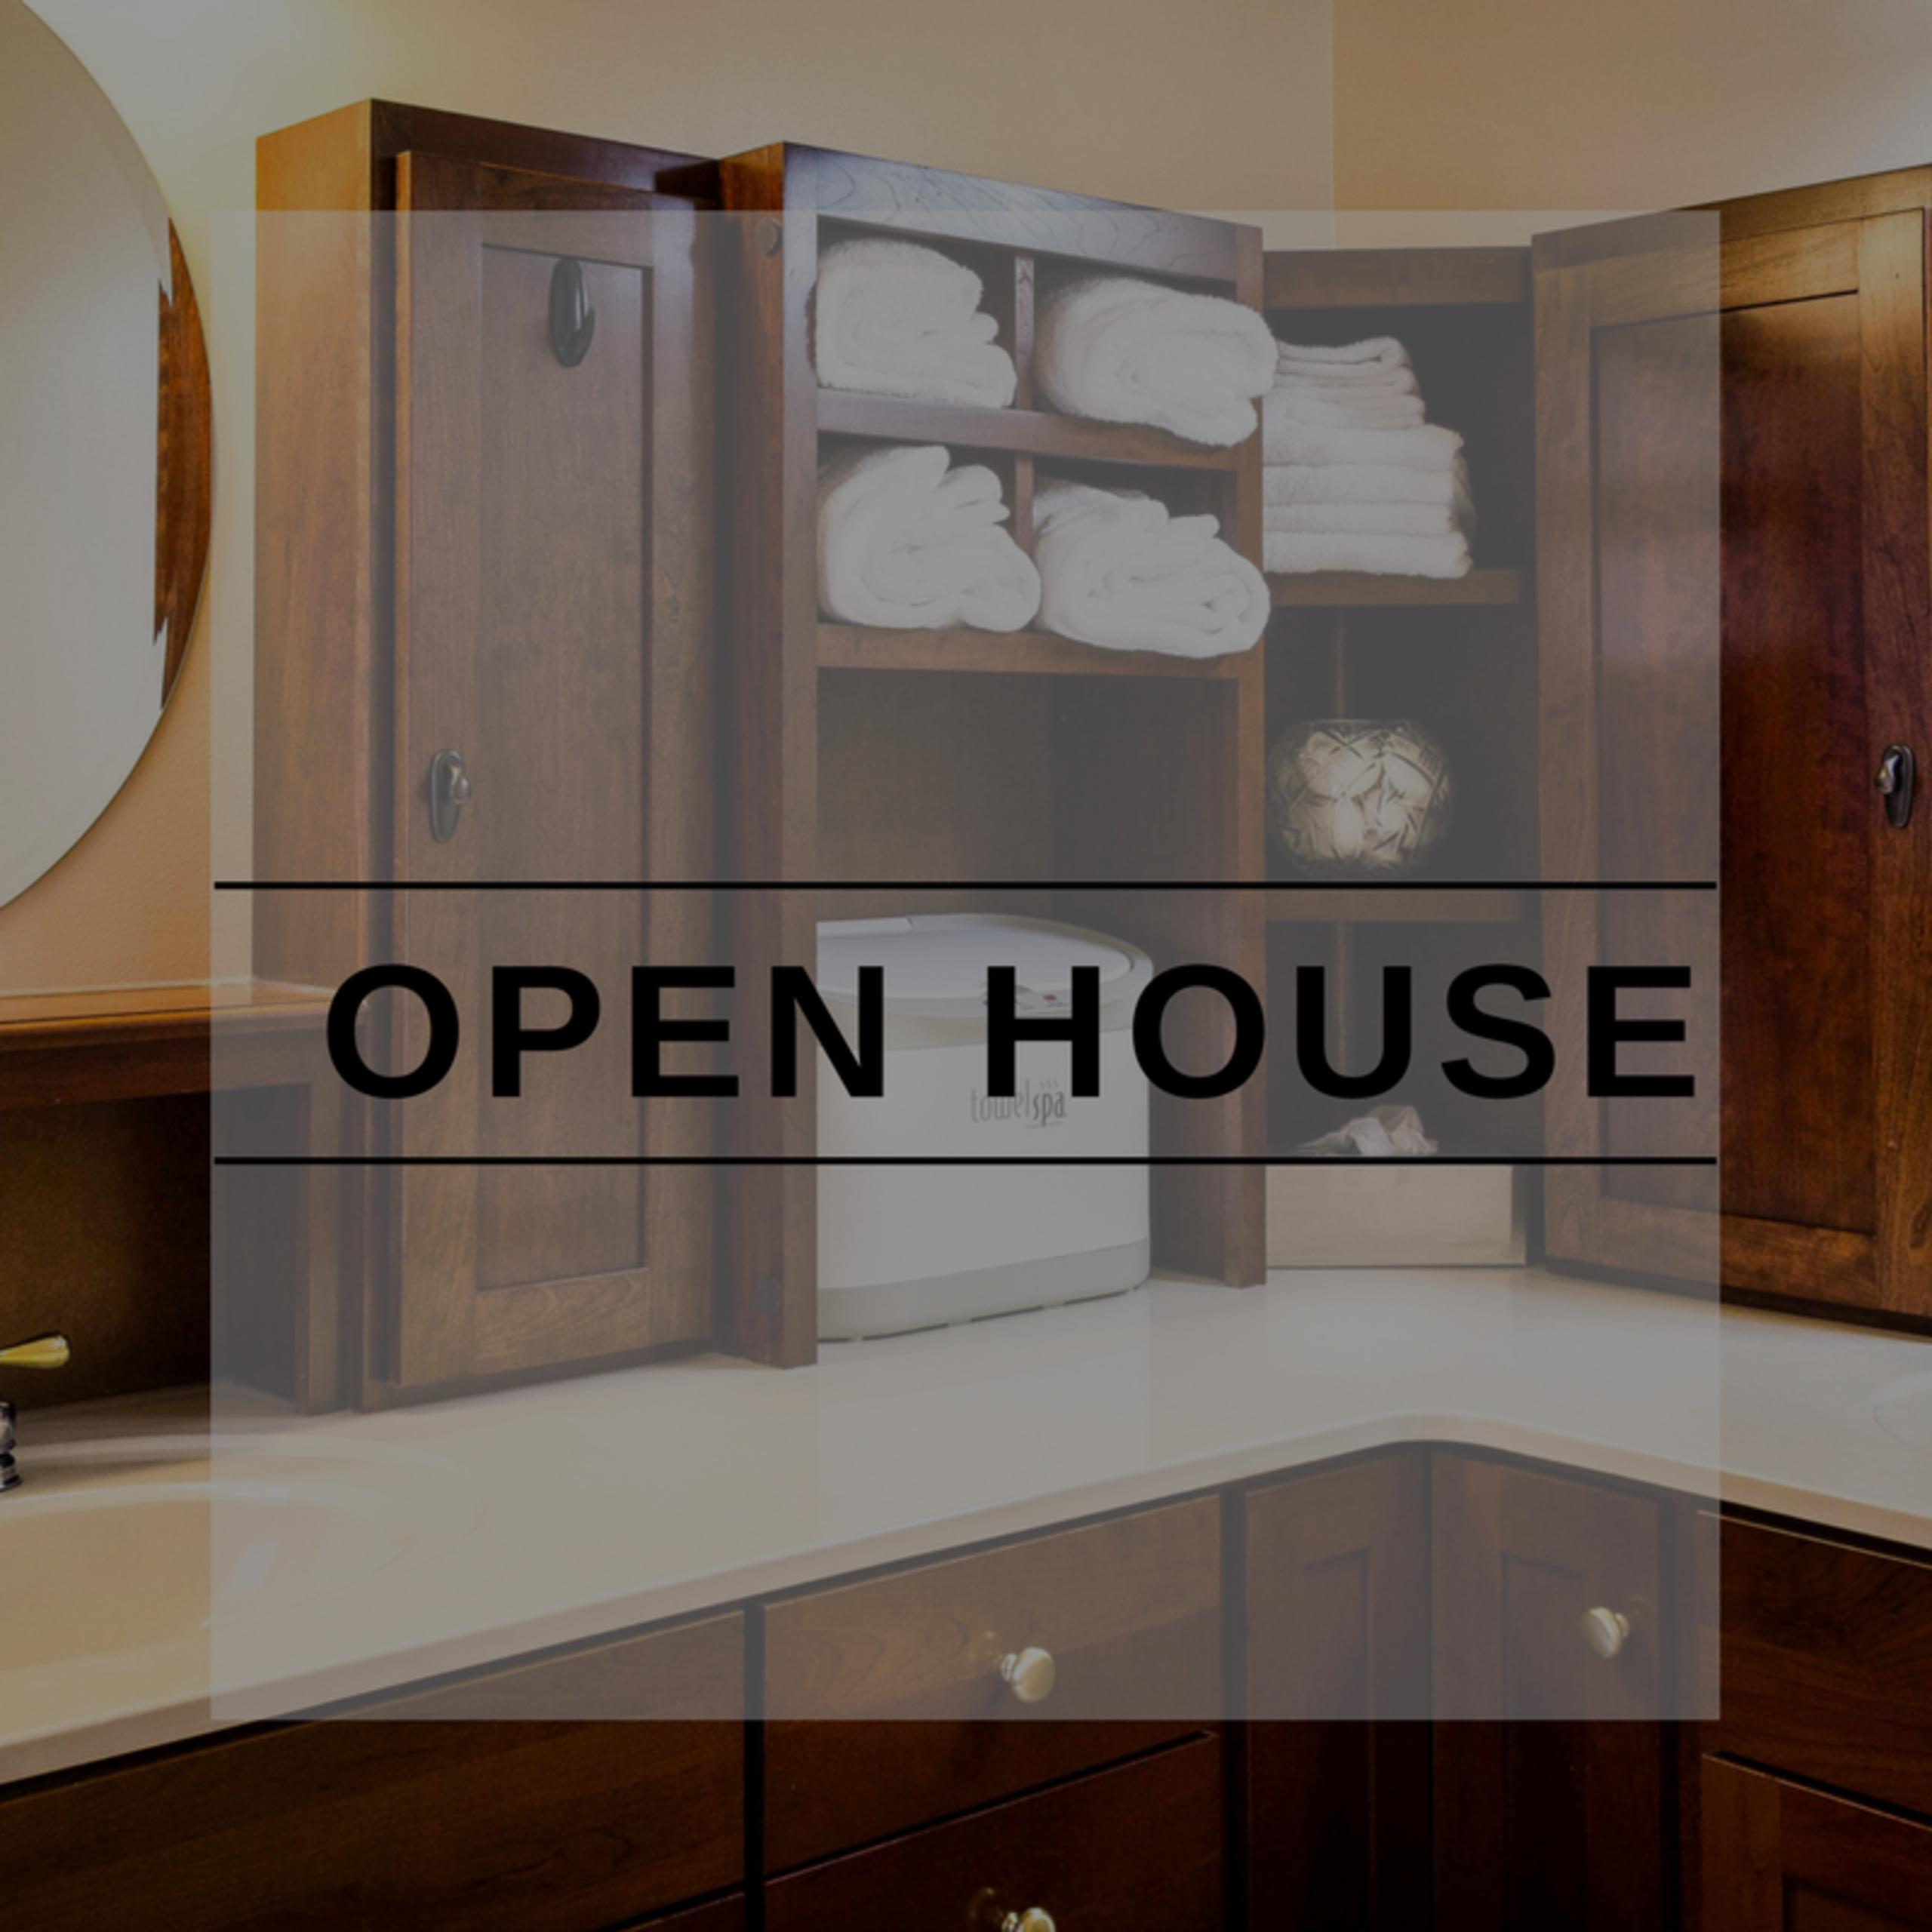 OPEN HOUSE LIST 3/10/18 – 3/11/18